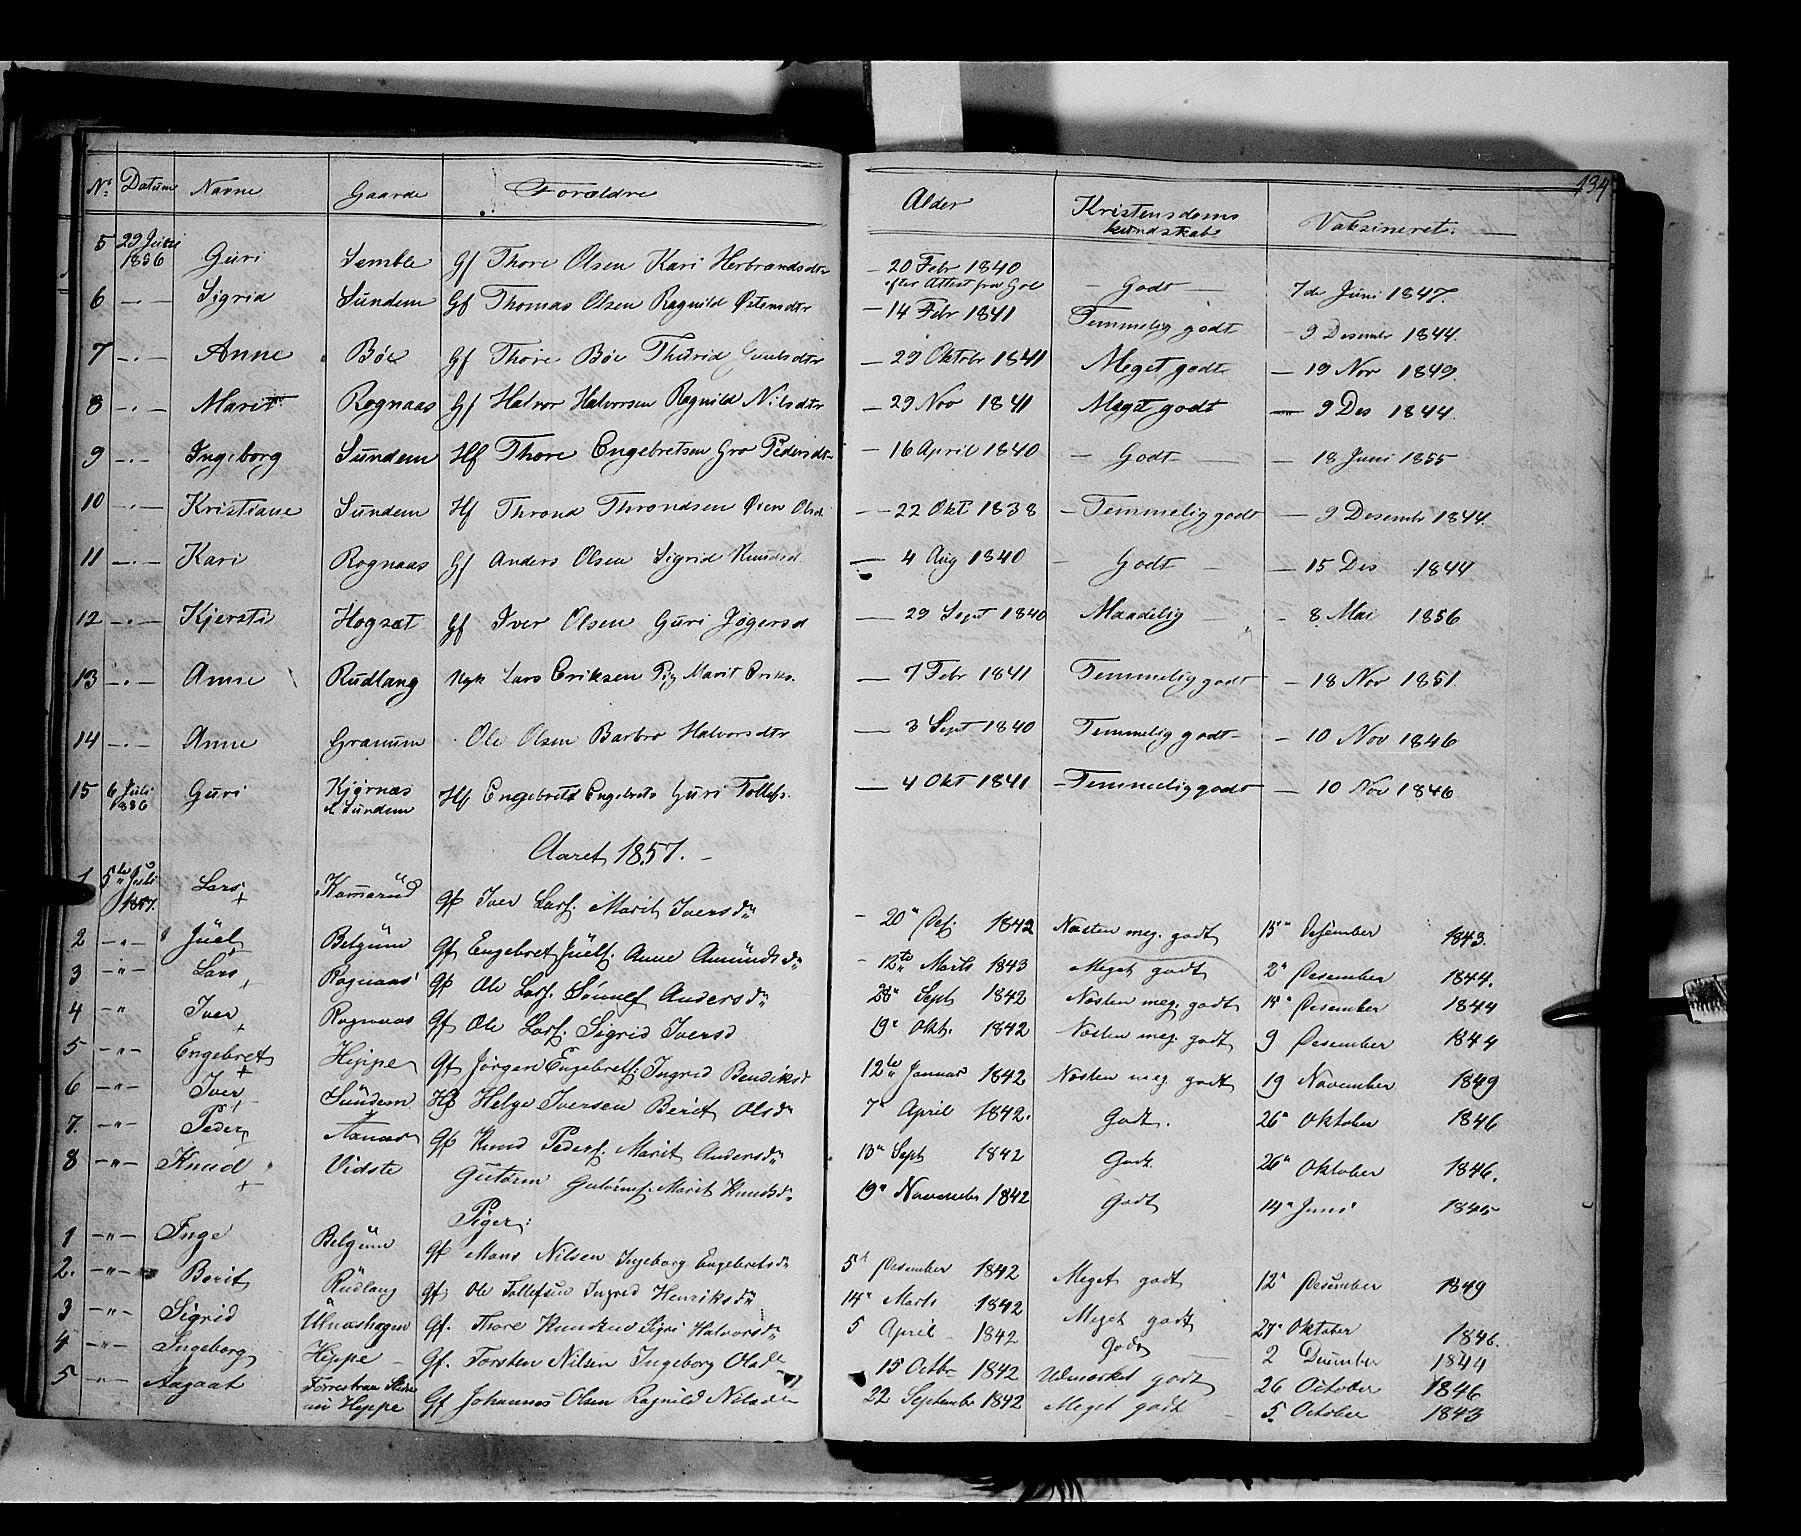 SAH, Nord-Aurdal prestekontor, Ministerialbok nr. 6, 1842-1863, s. 134